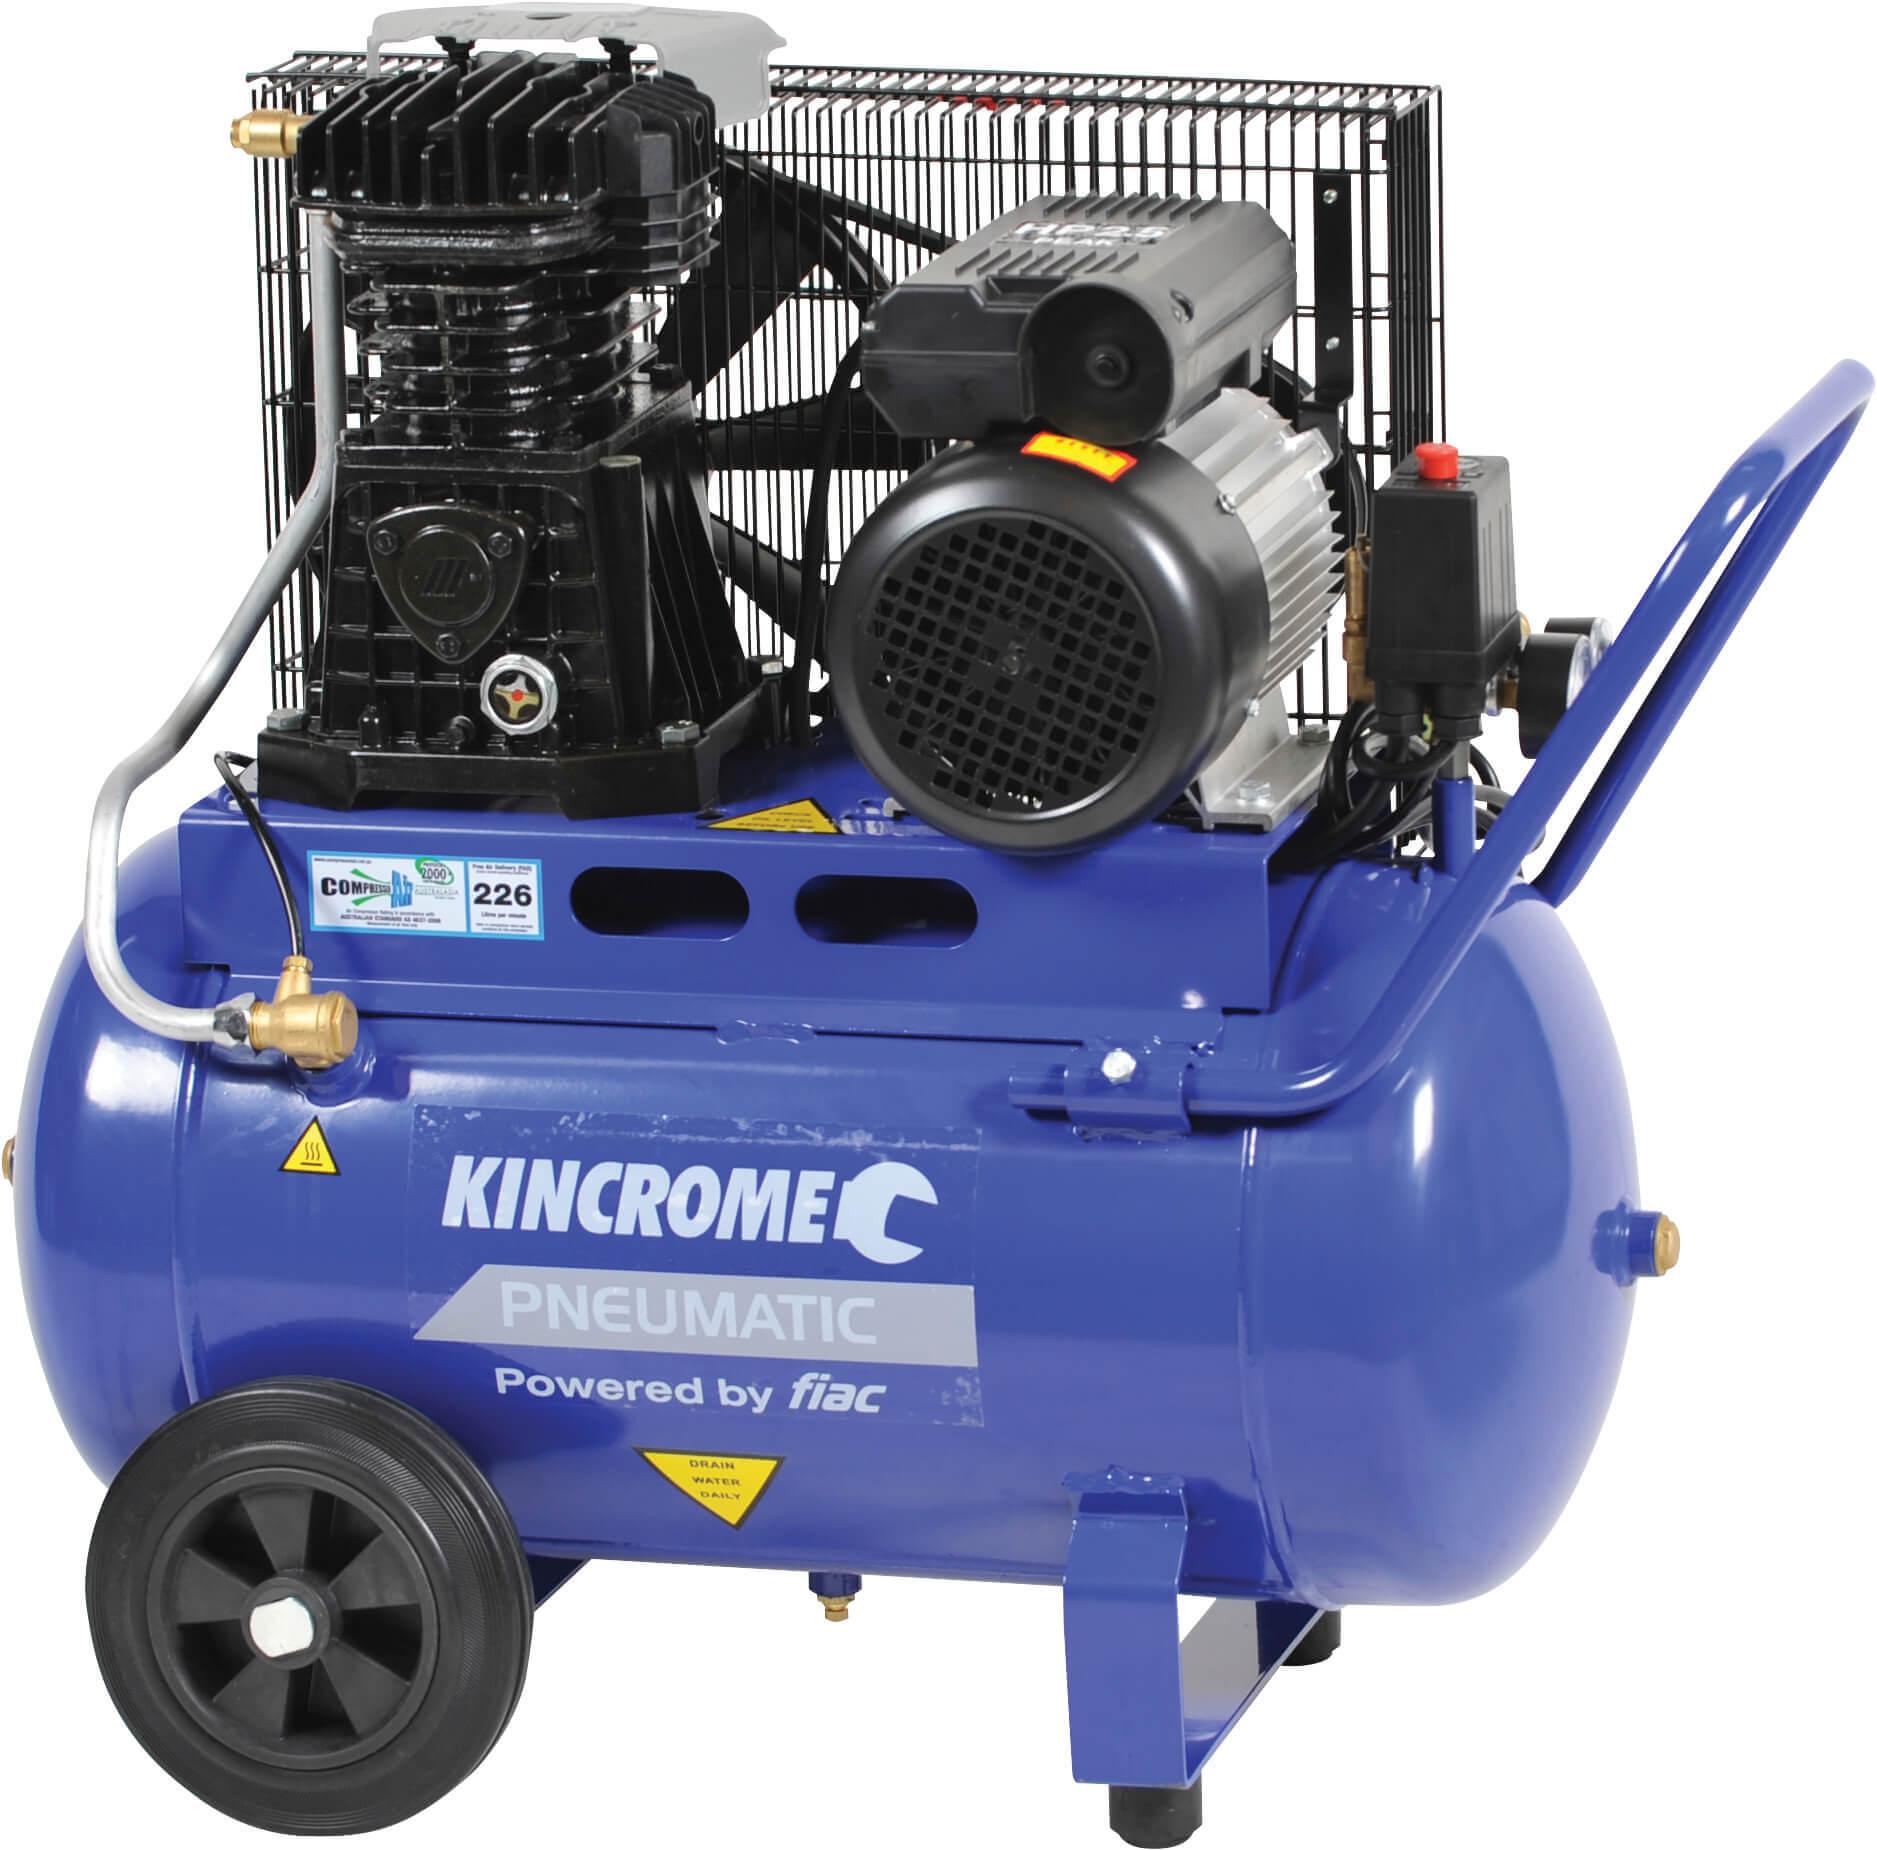 kincrome-product2.jpg